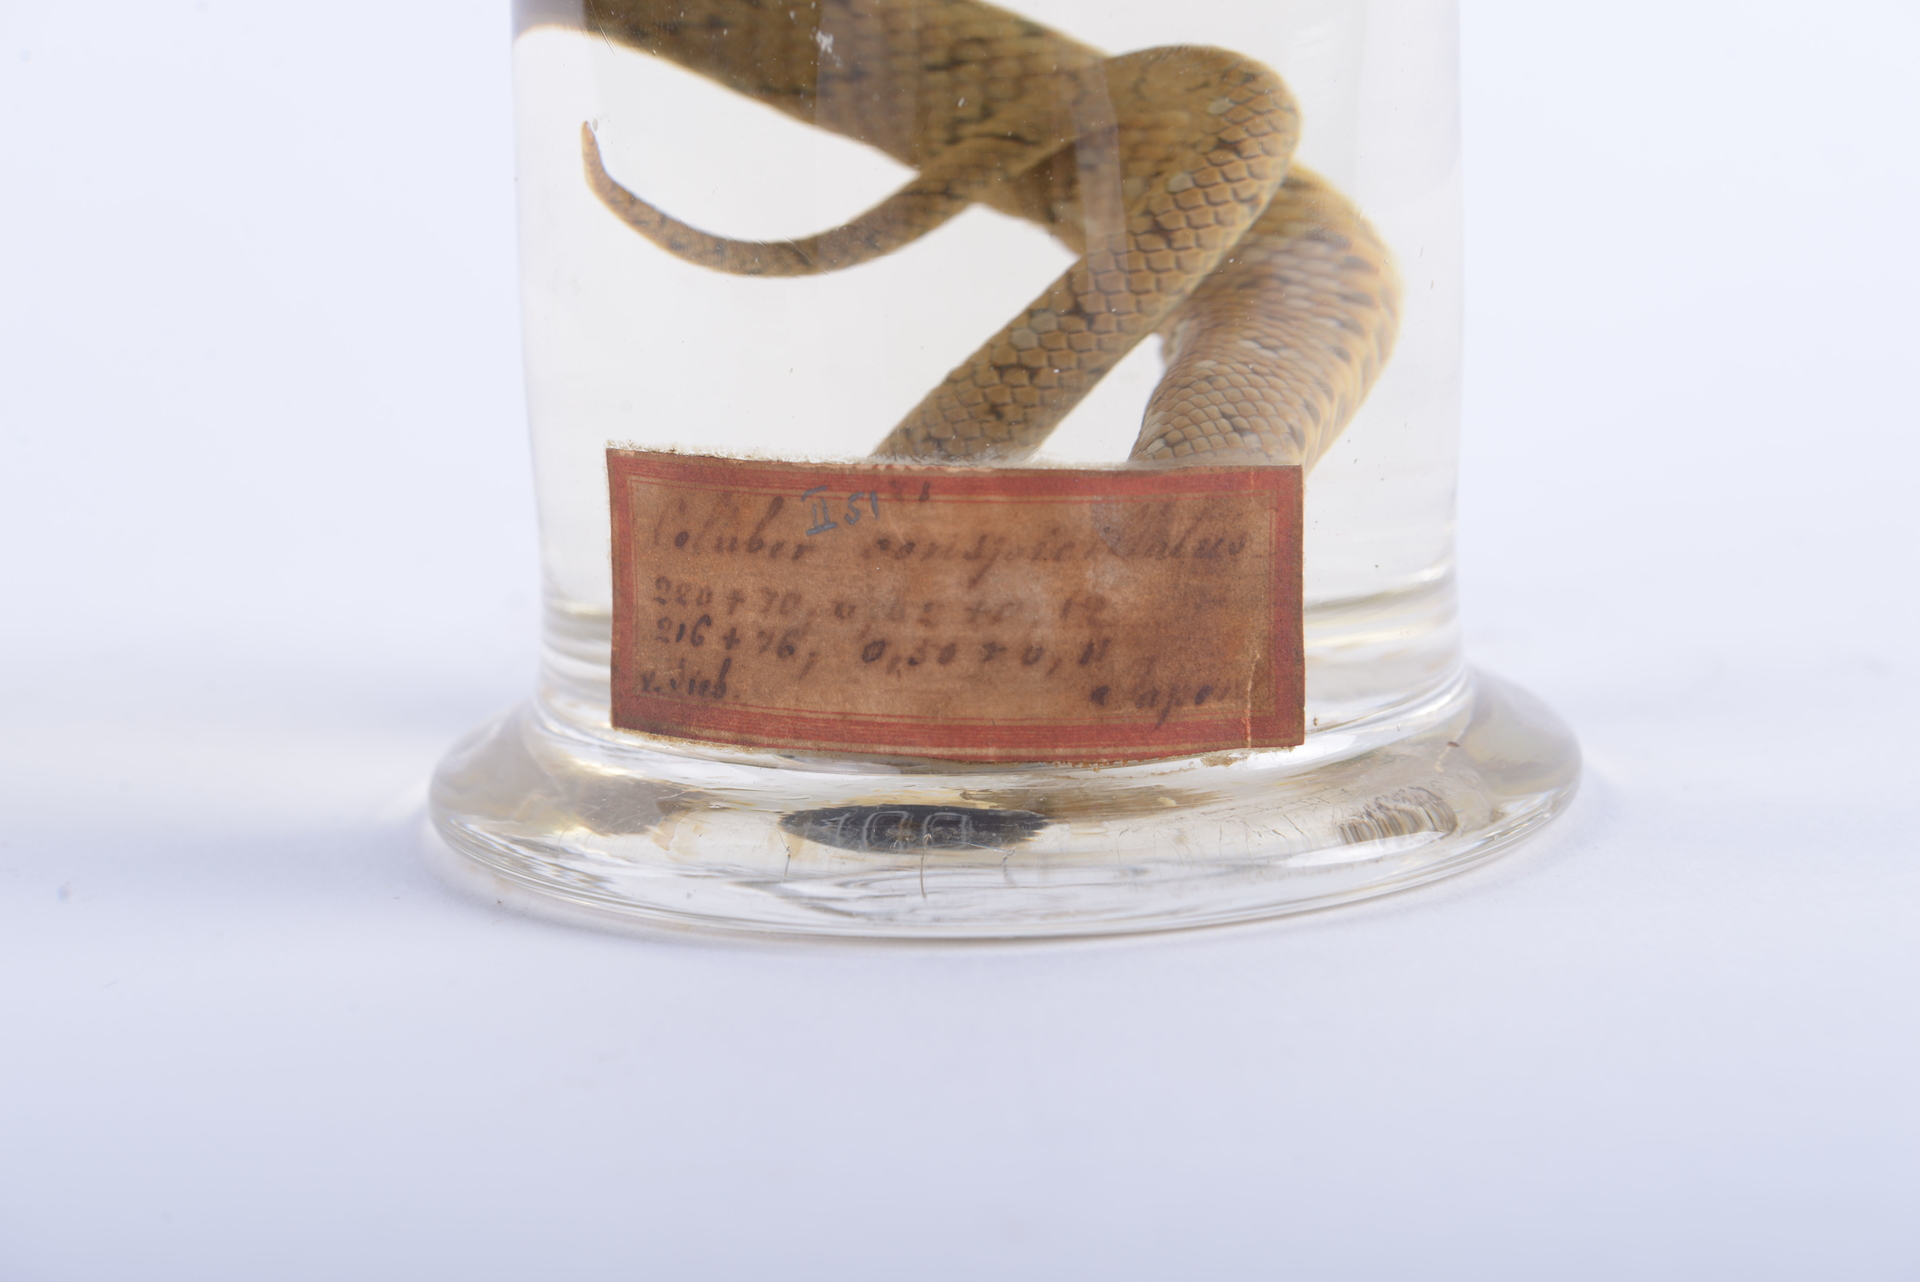 RMNH.RENA.400.b   Elaphe conspicillata (Boie, 1826)